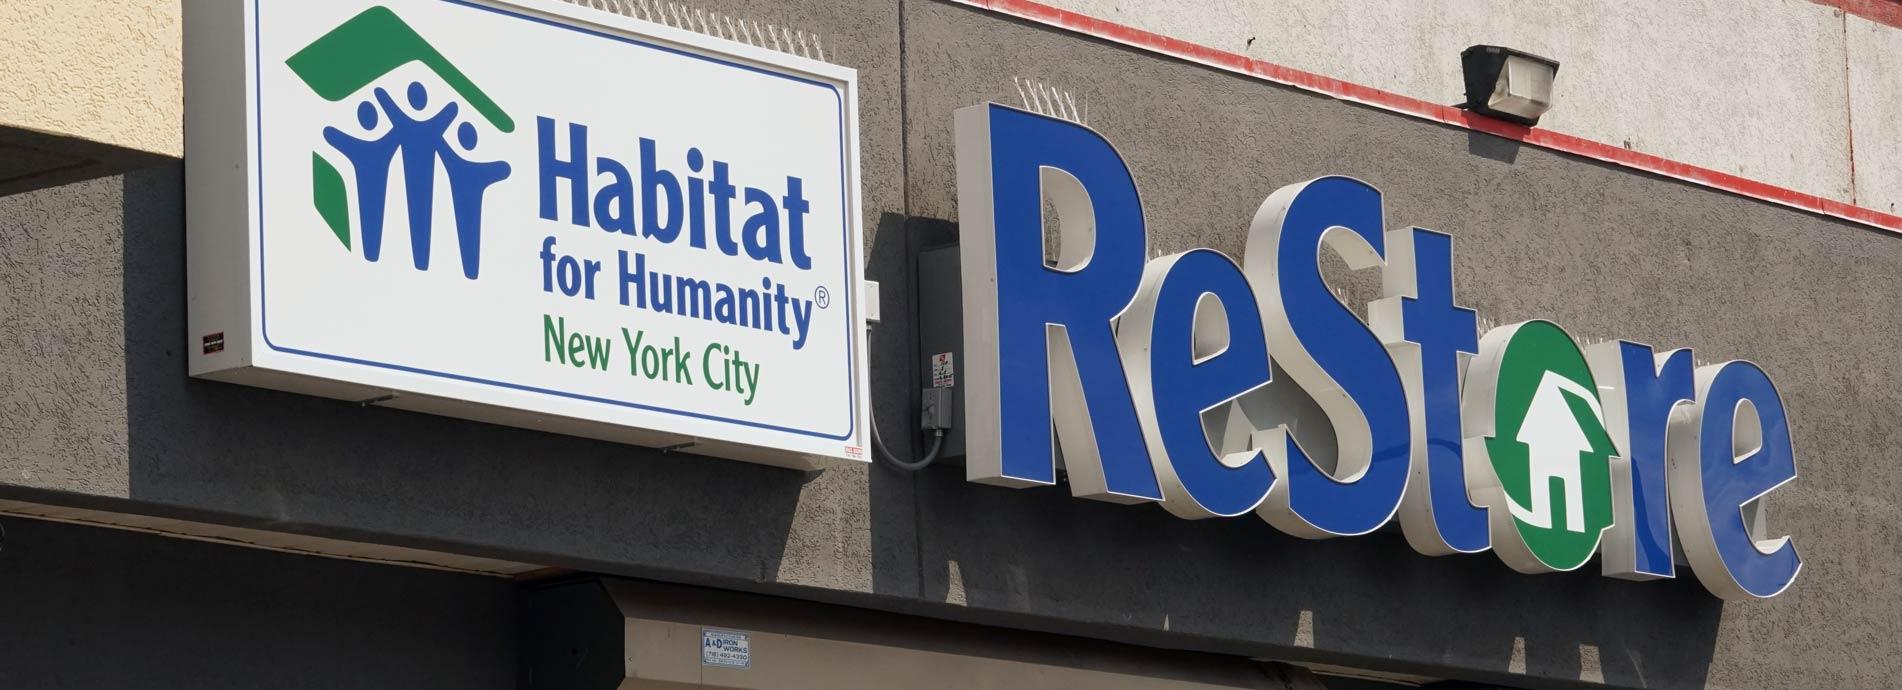 Restore Habitat For Humanity New York City